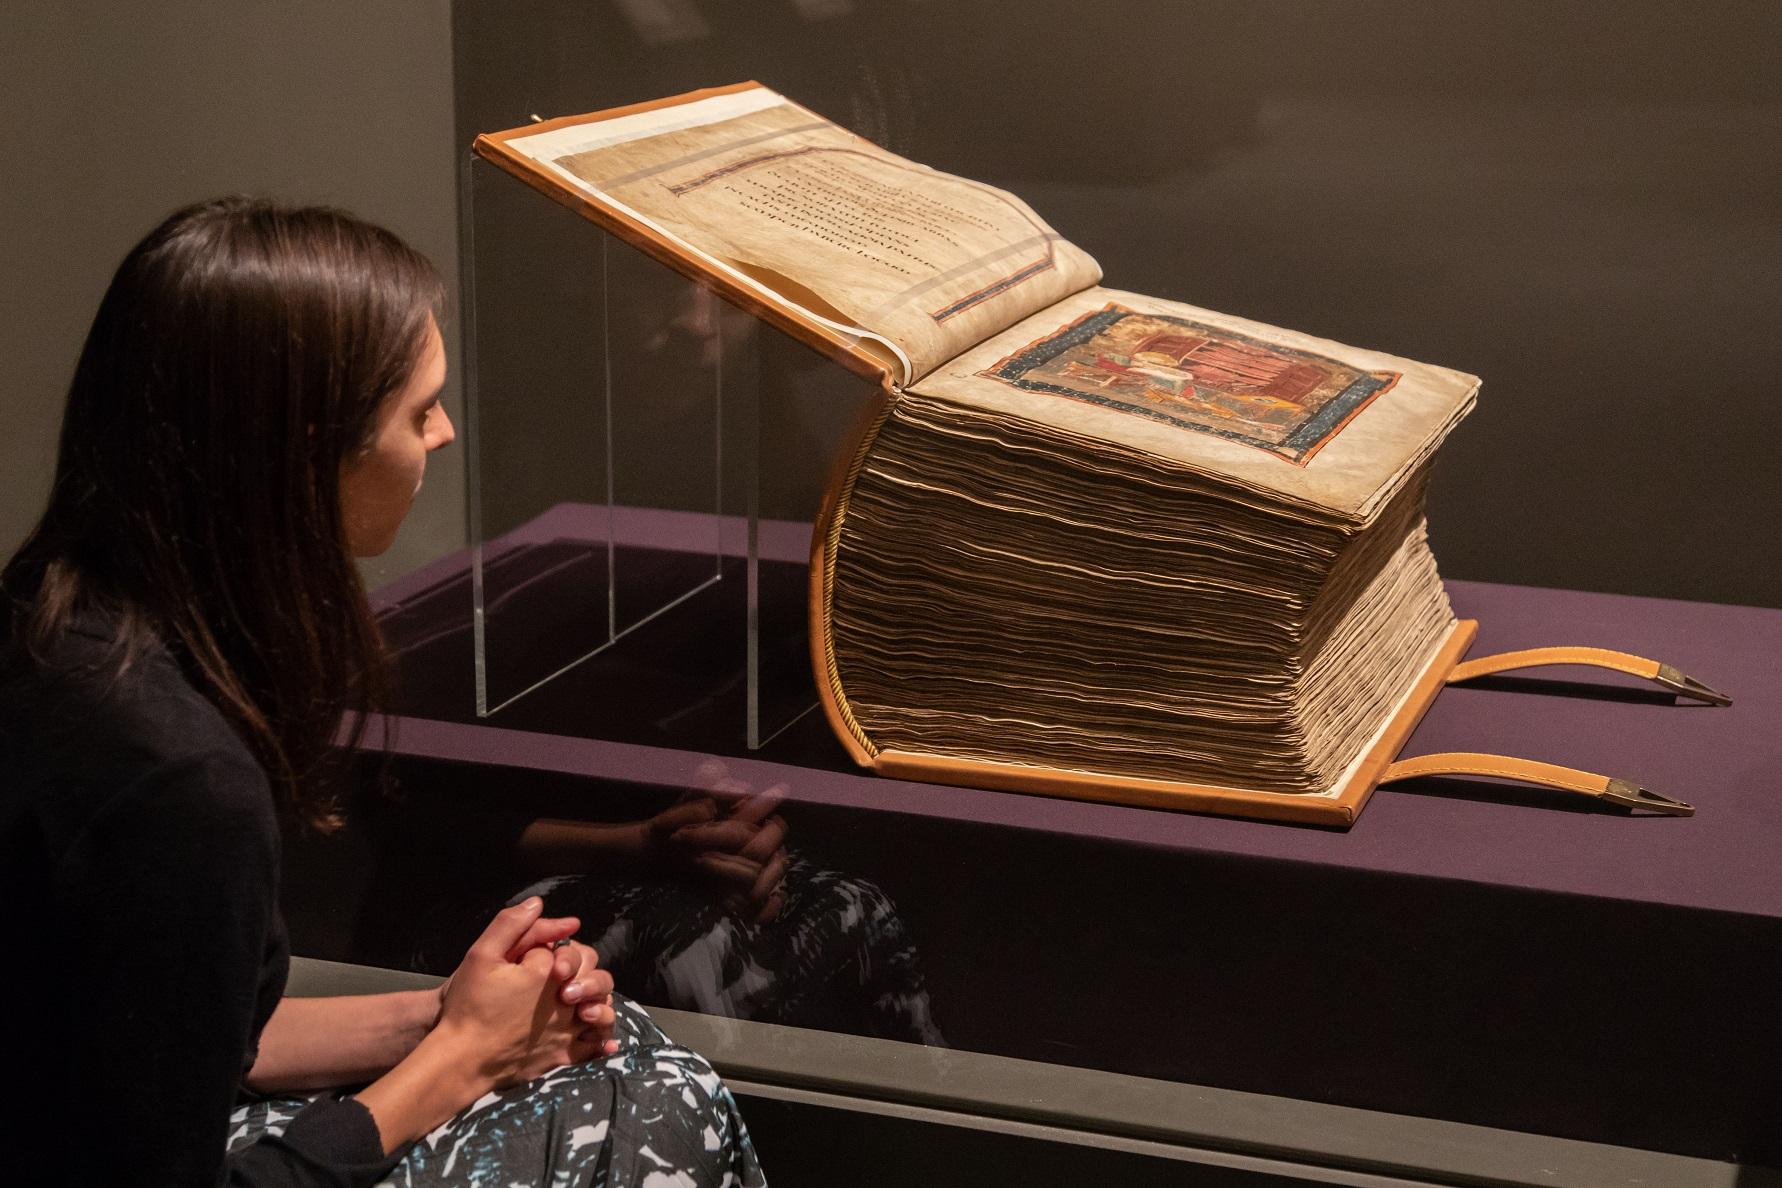 codex-amiatinus-biblioteca-medicea-laurenziana